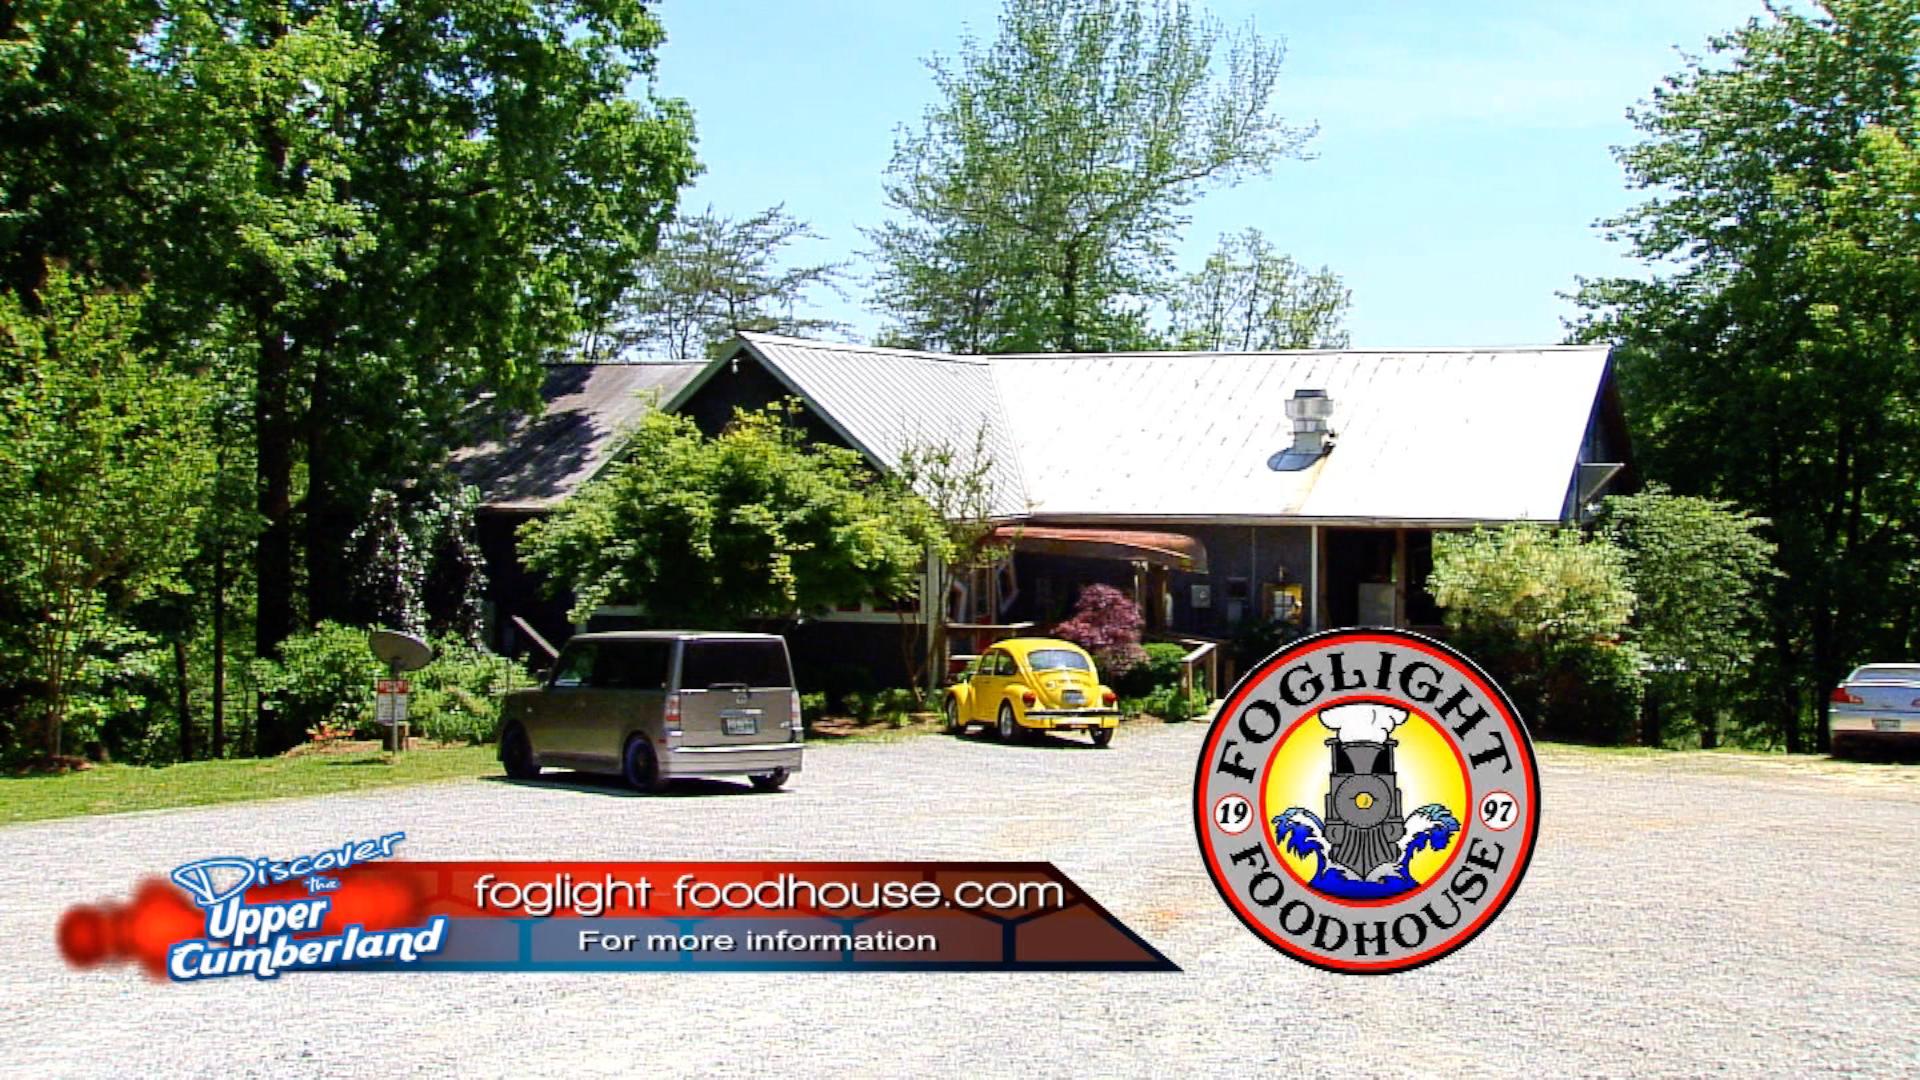 Foglight Foodhouse | White Co.